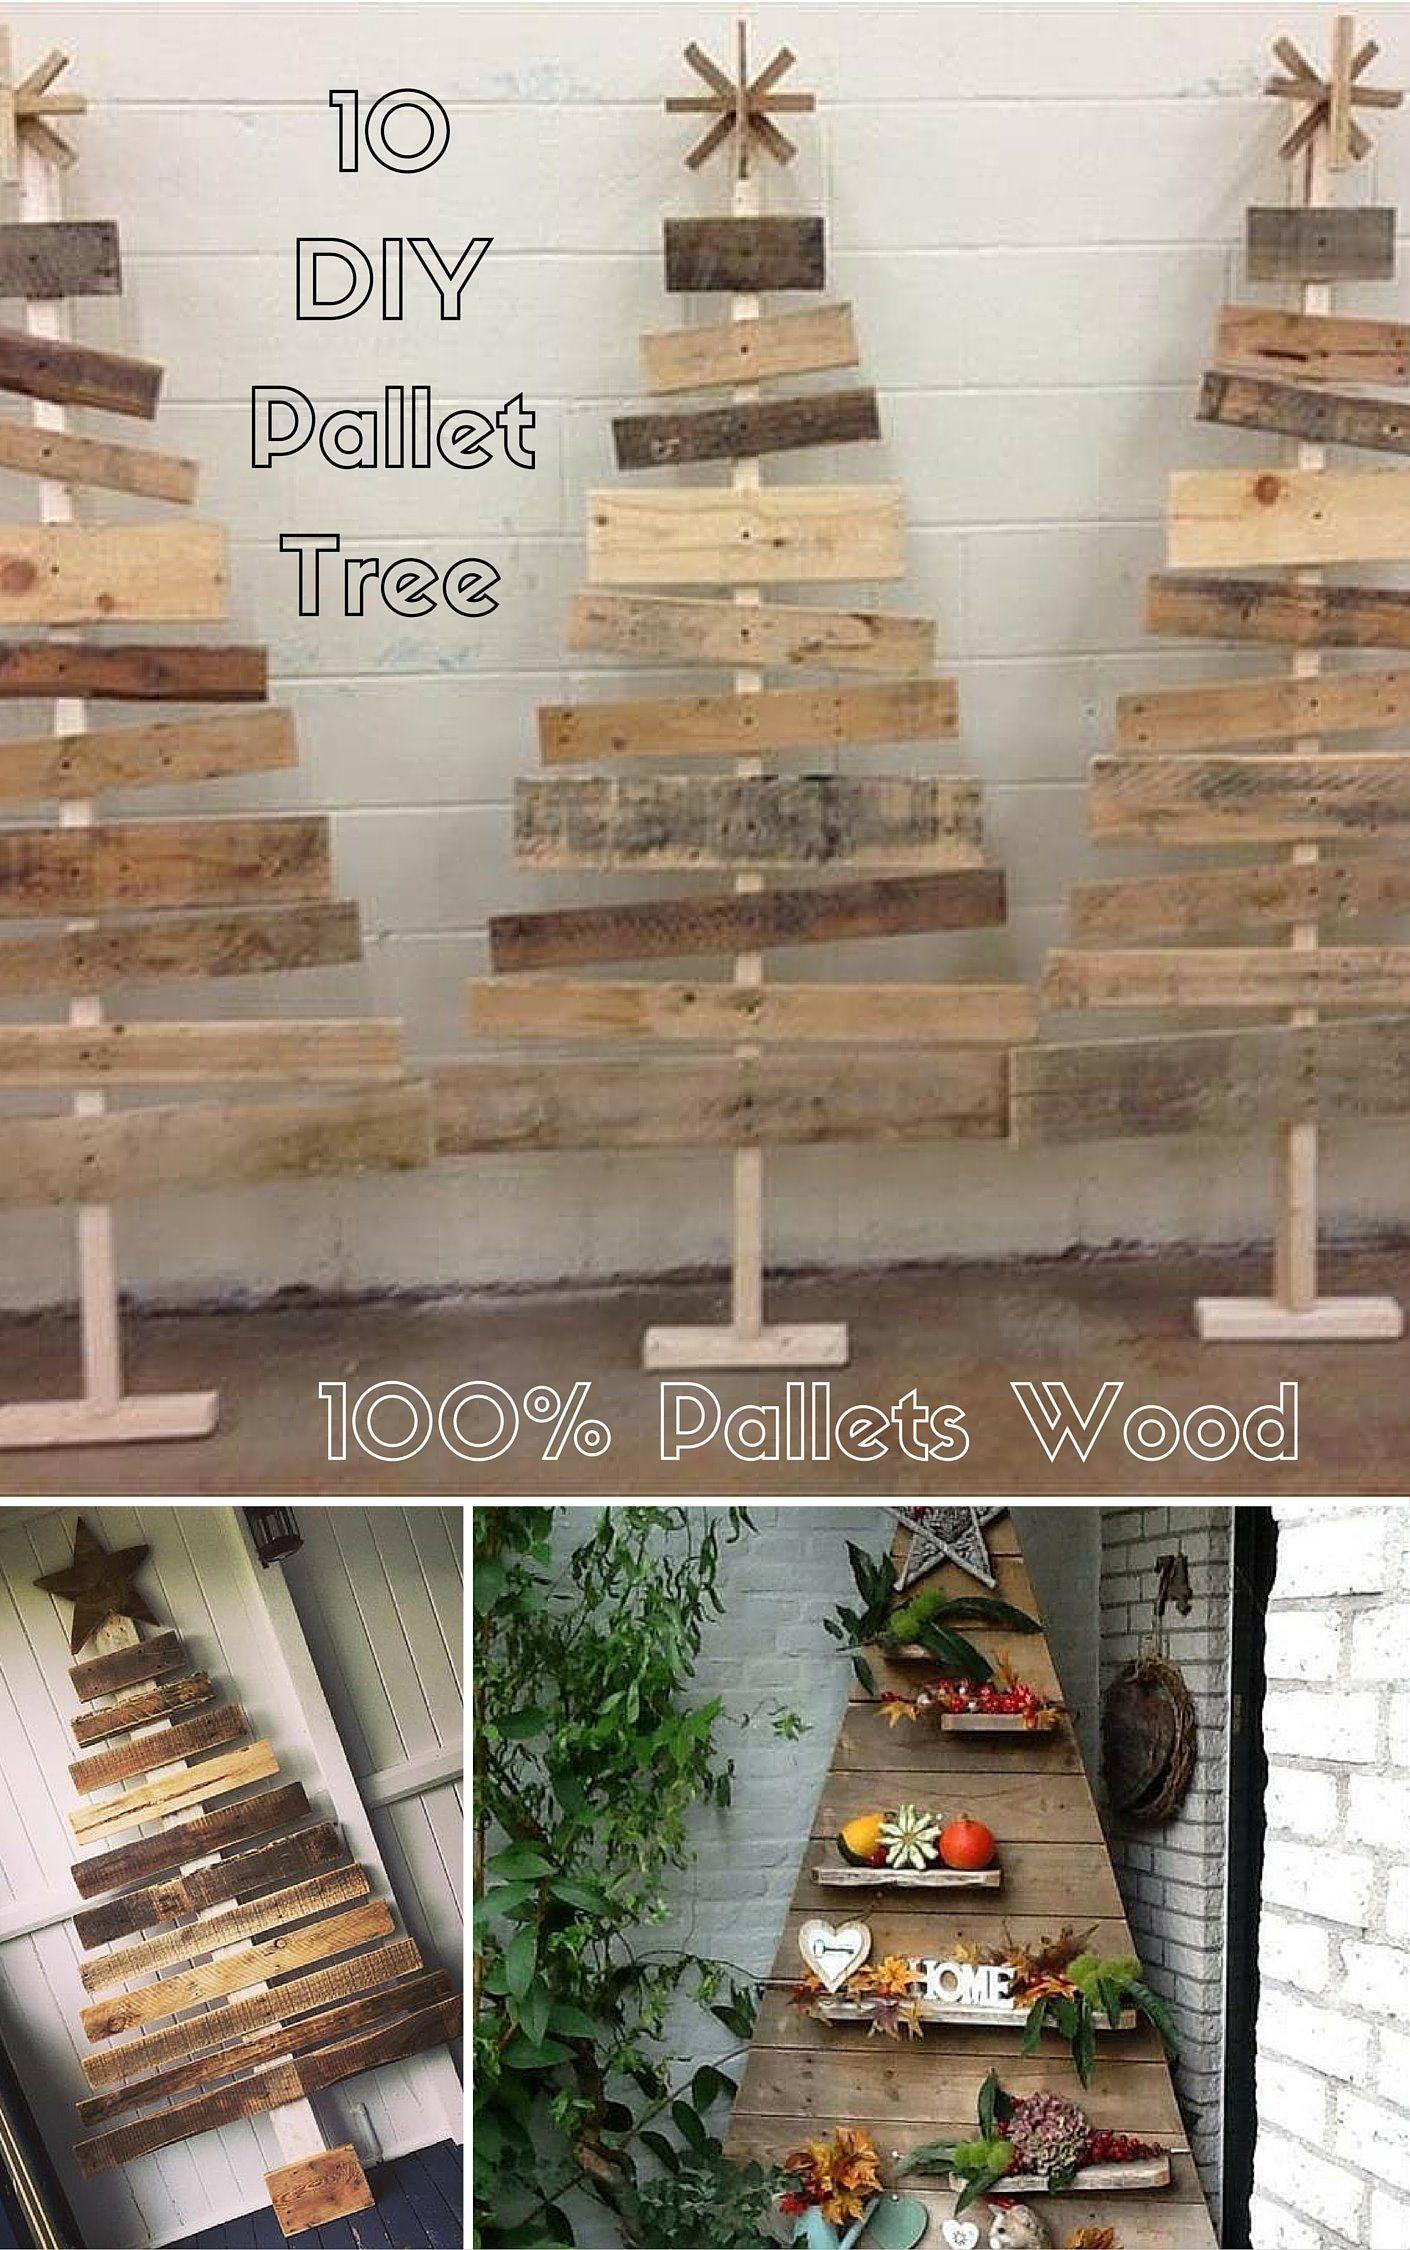 150 Best Diy Pallet Projects Pallet Furniture Ideas Pallet Tree Pallet Christmas Tree Wood Pallet Projects